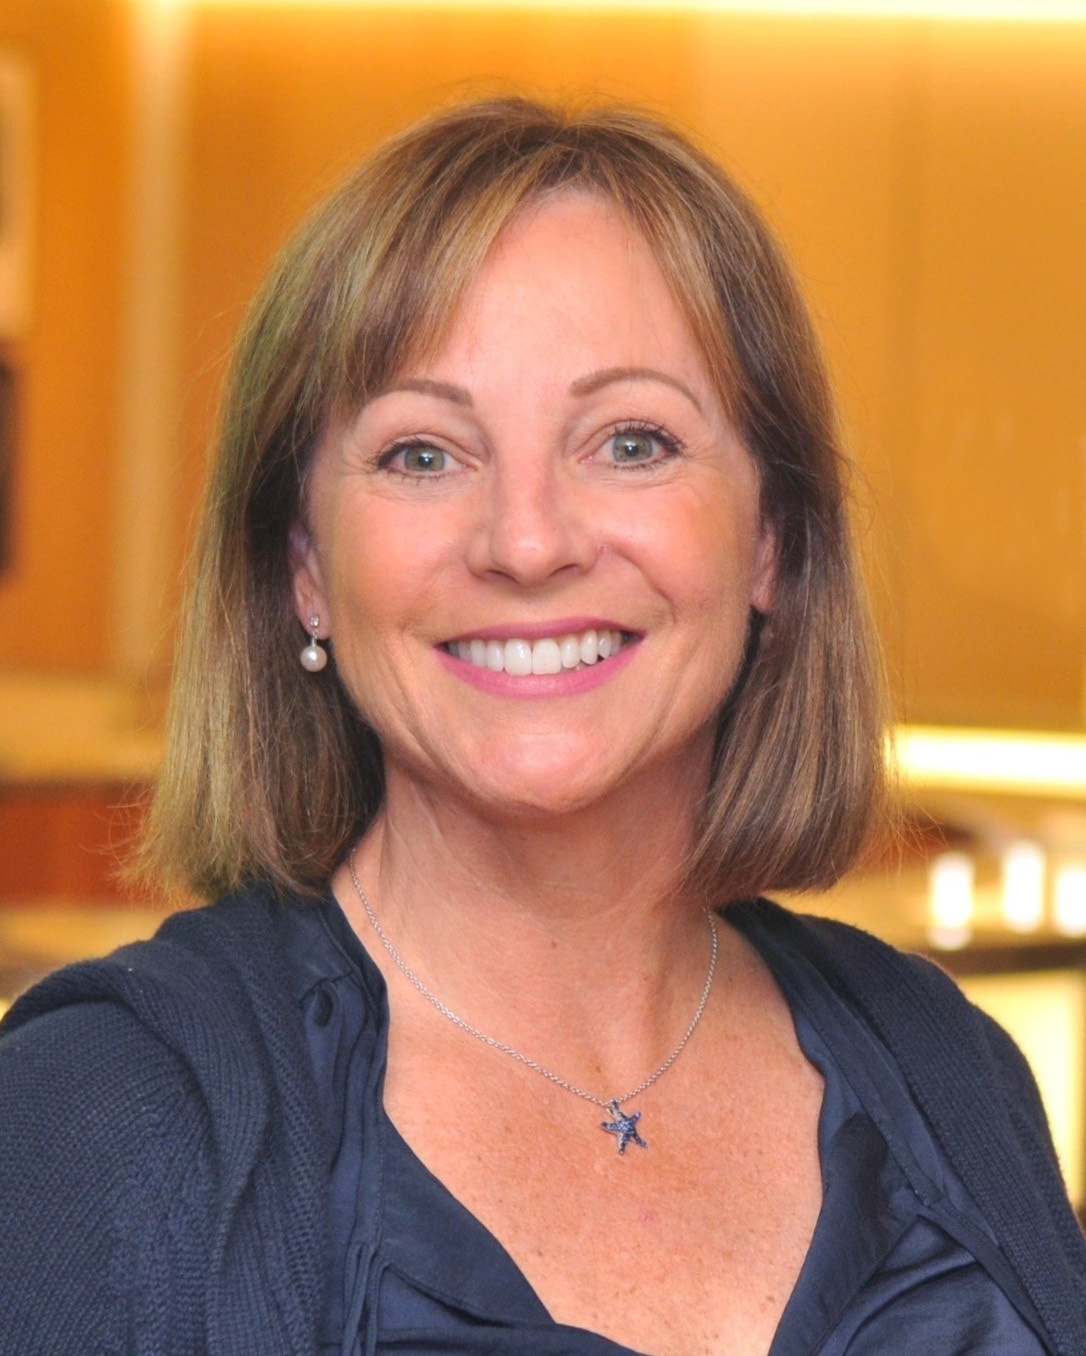 Christine Cousart